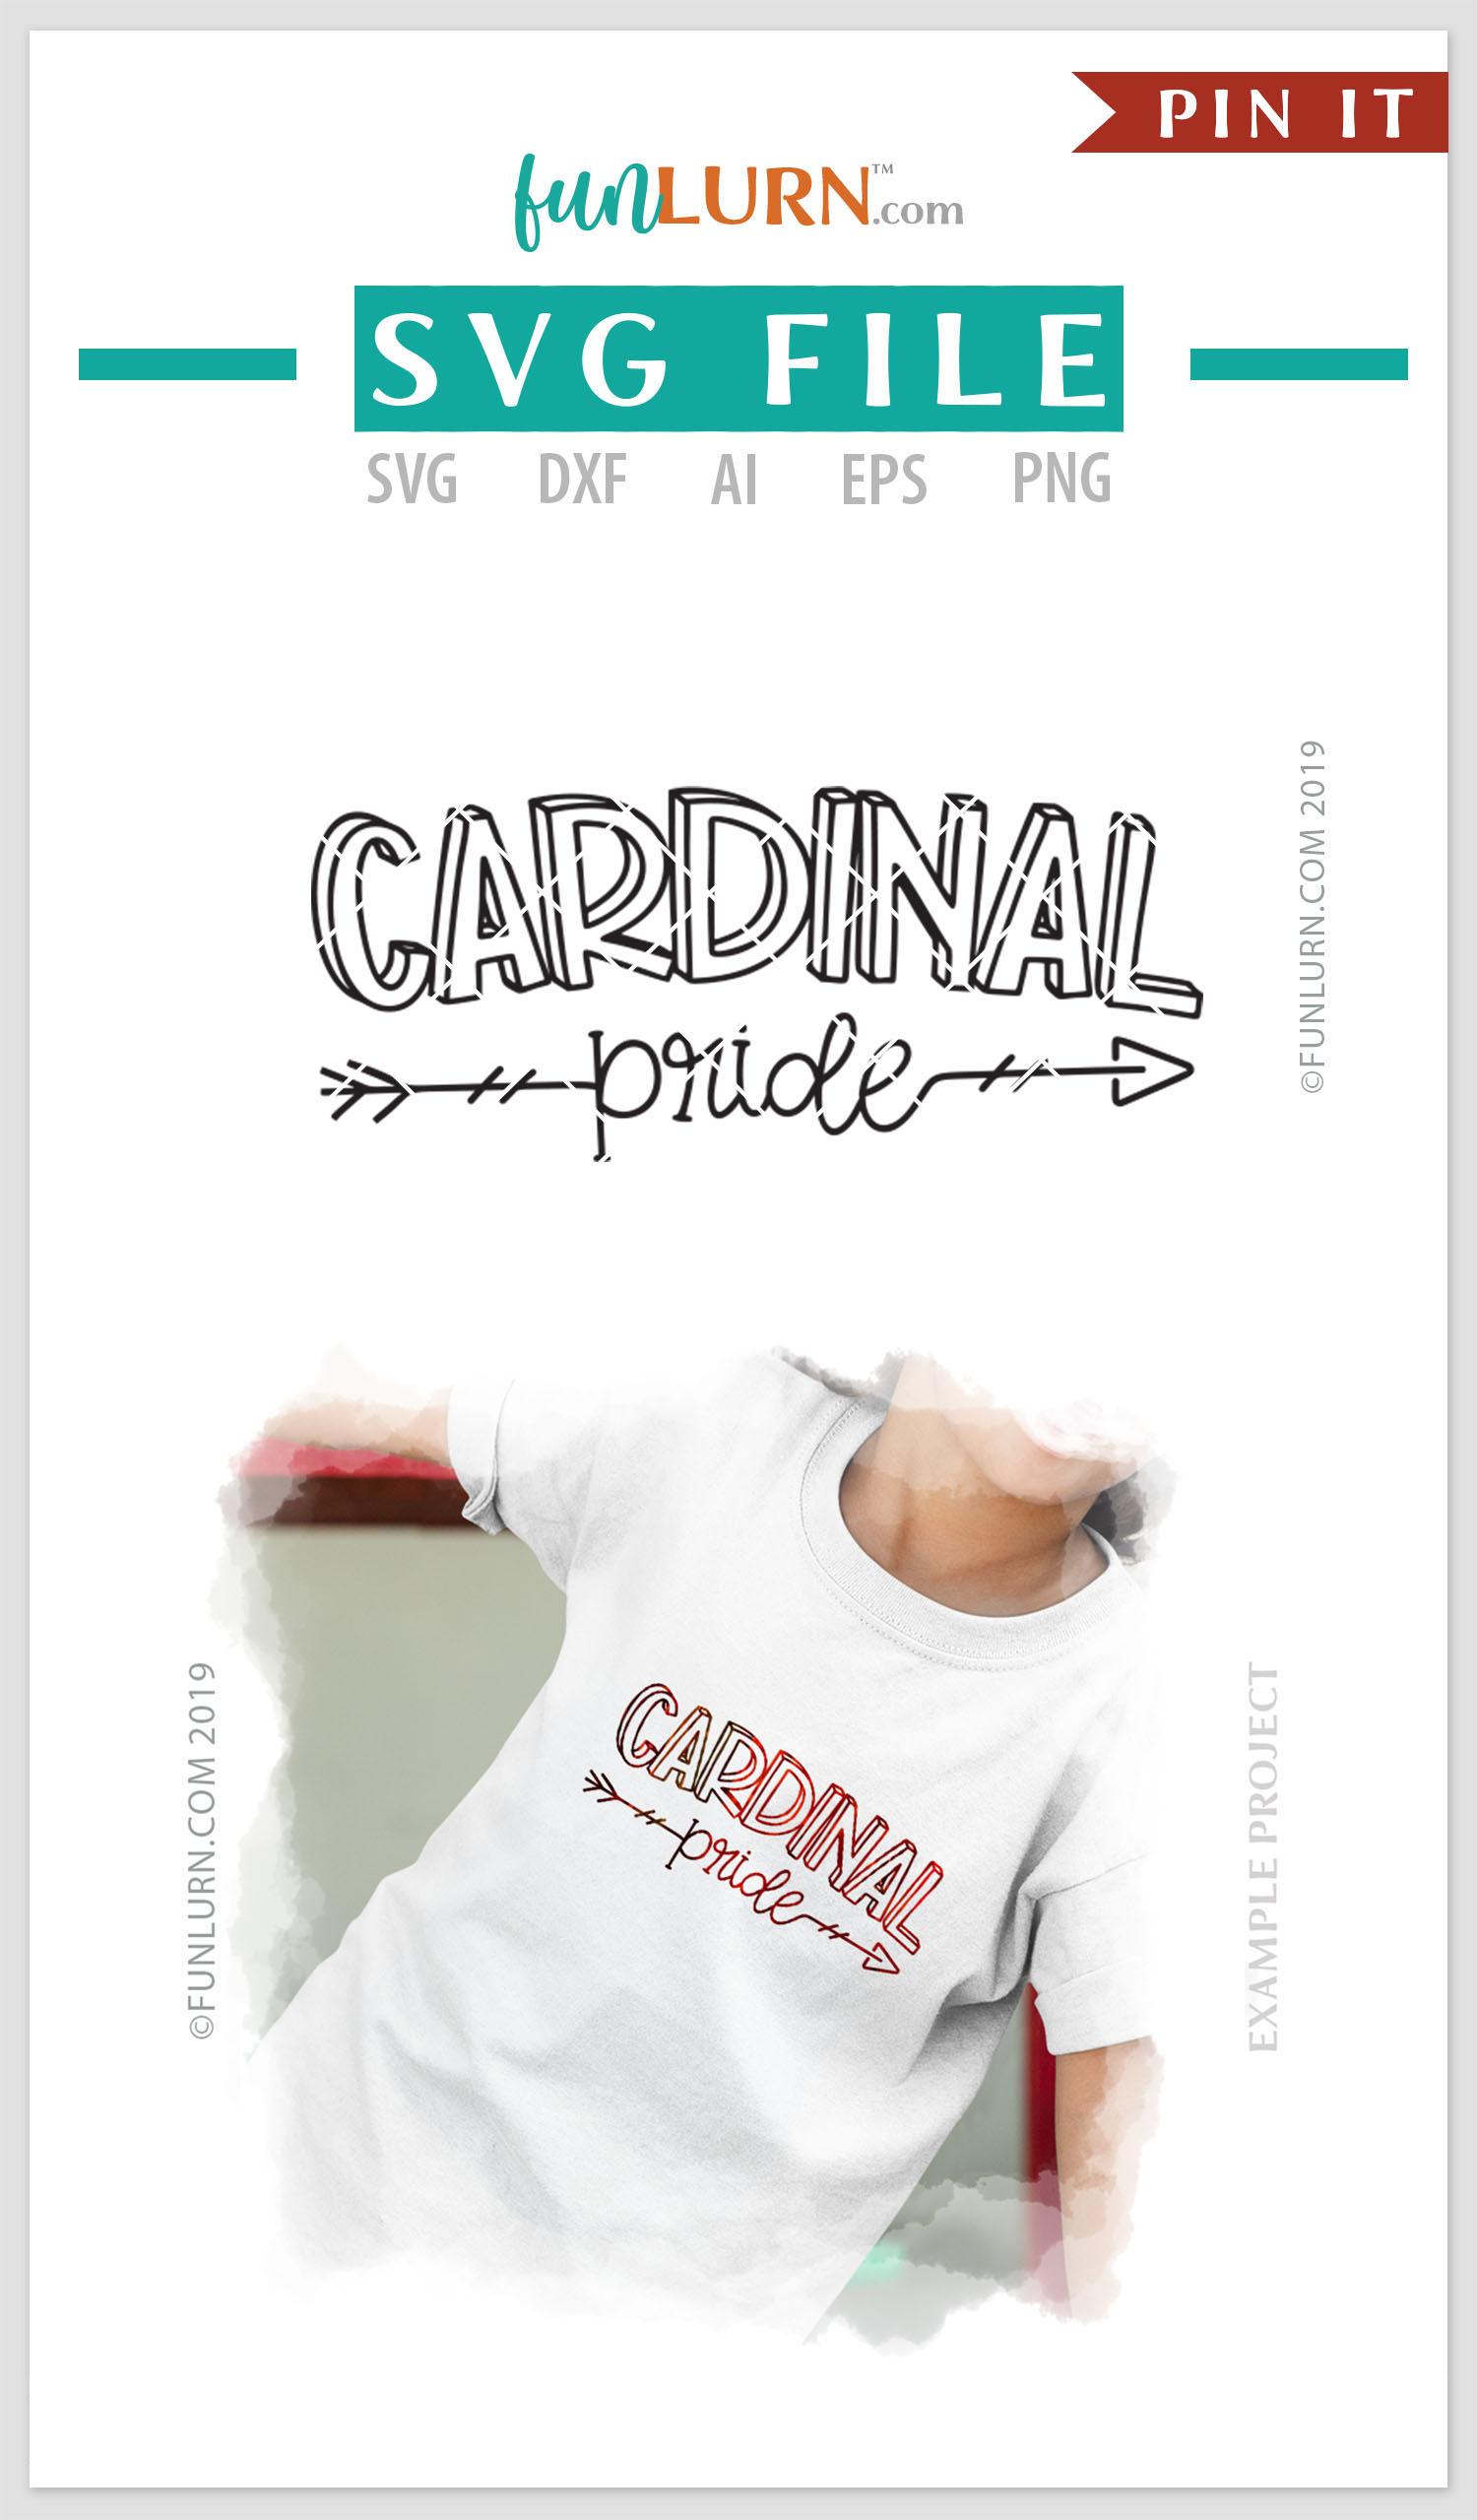 Cardinal Pride Team SVG Cut File example image 4